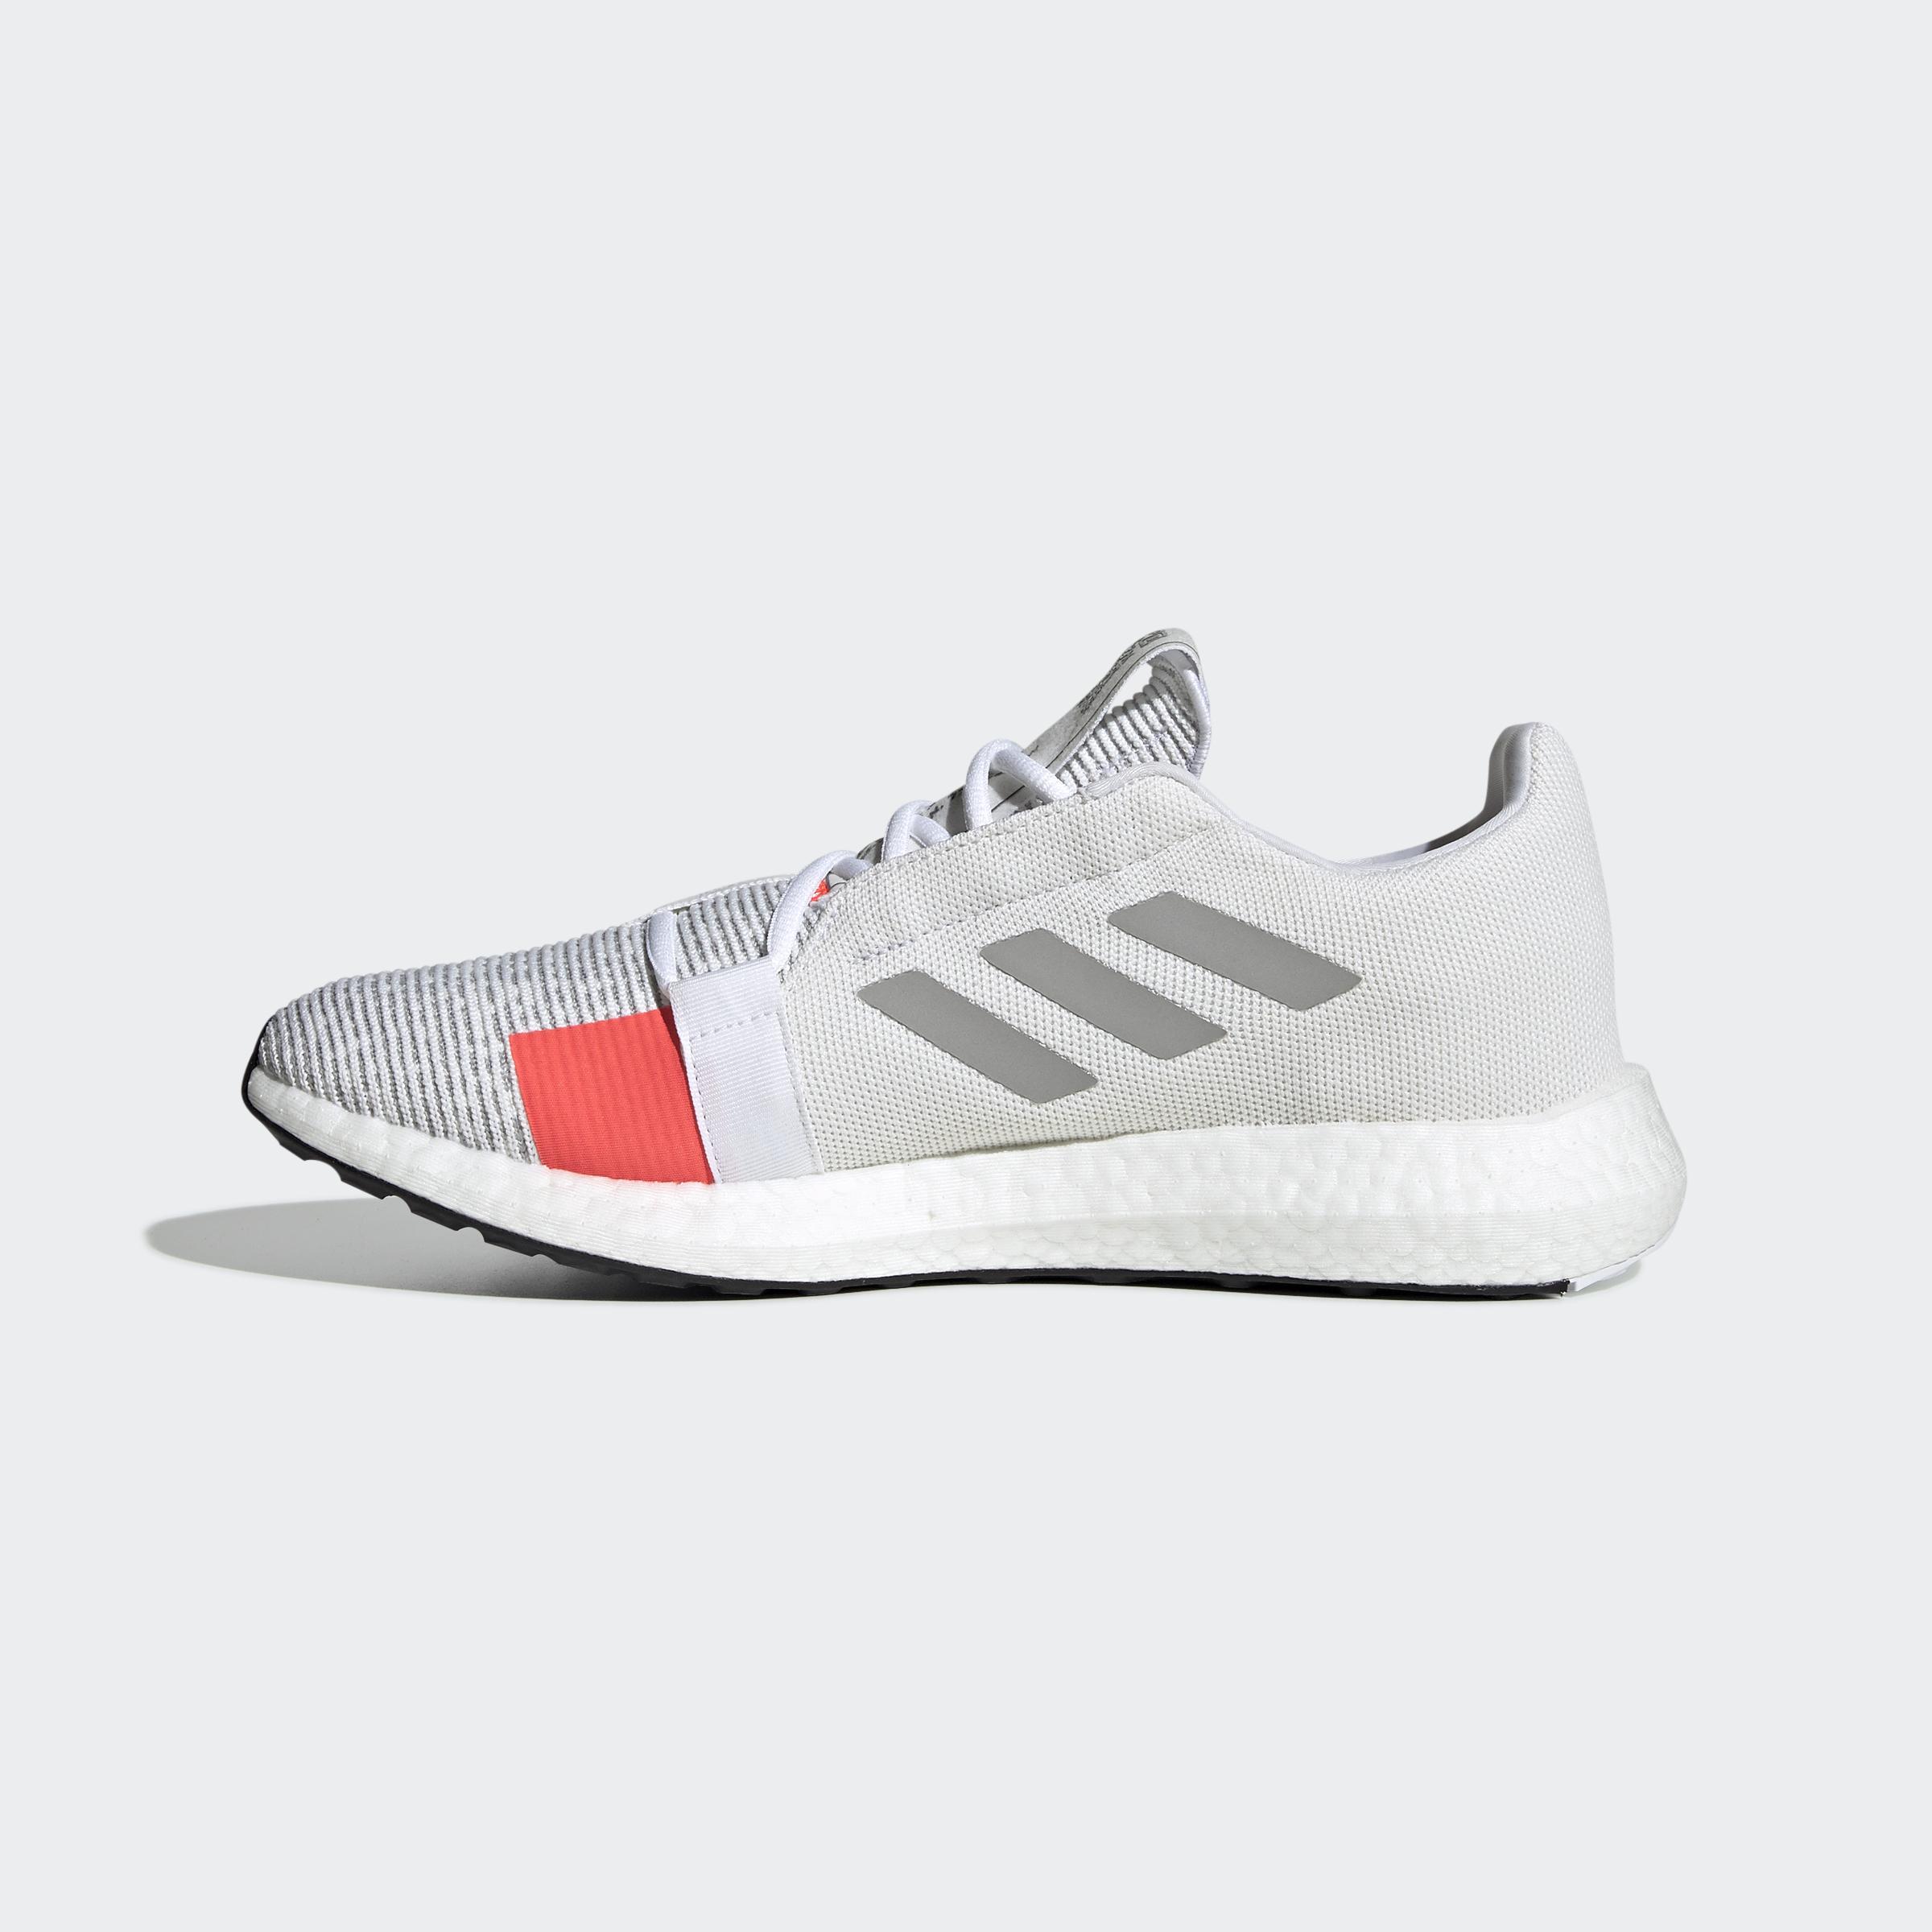 miniature 62 - adidas Senseboost Go Shoes Men's Athletic & Sneakers